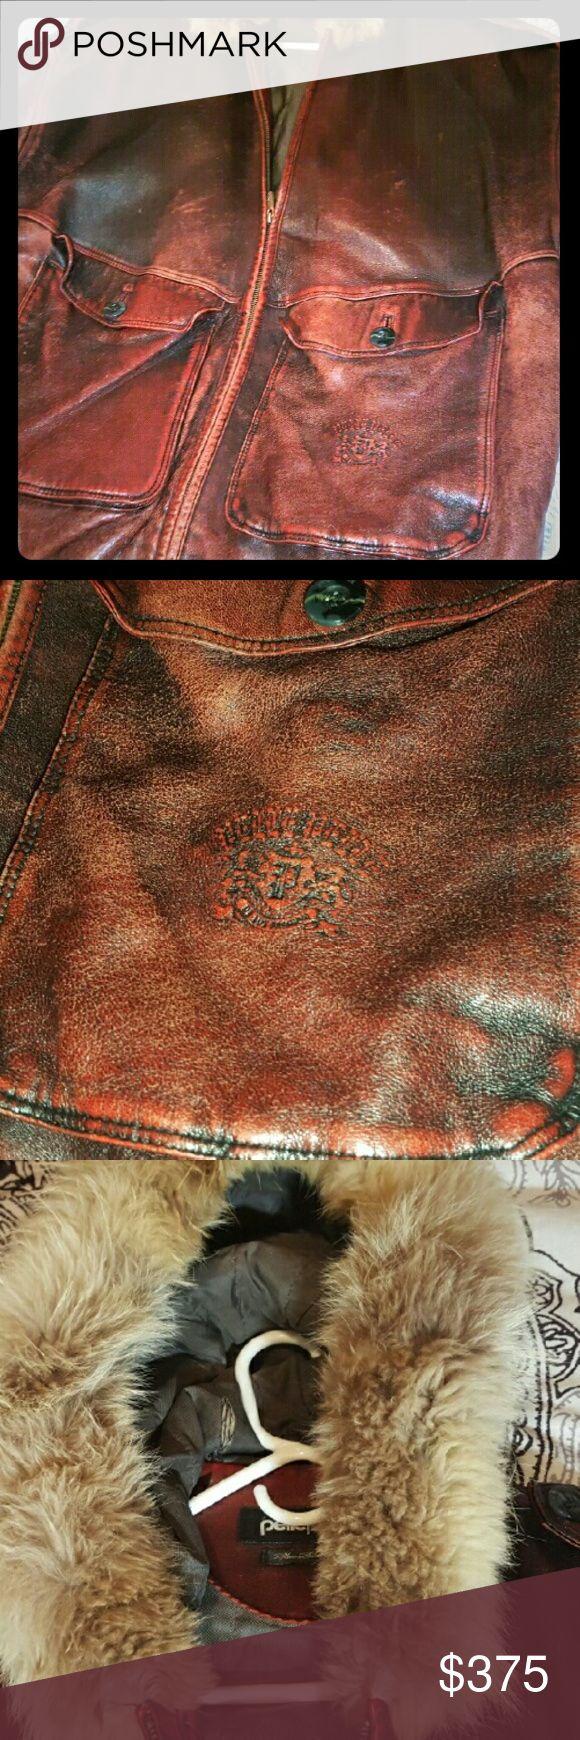 Rare vintage burgandy colored pelle pelle Rare vintage burgandy colored pelle pelle heavy and very warm... this is my favorite leather jacket... pelle pelle Jackets & Coats